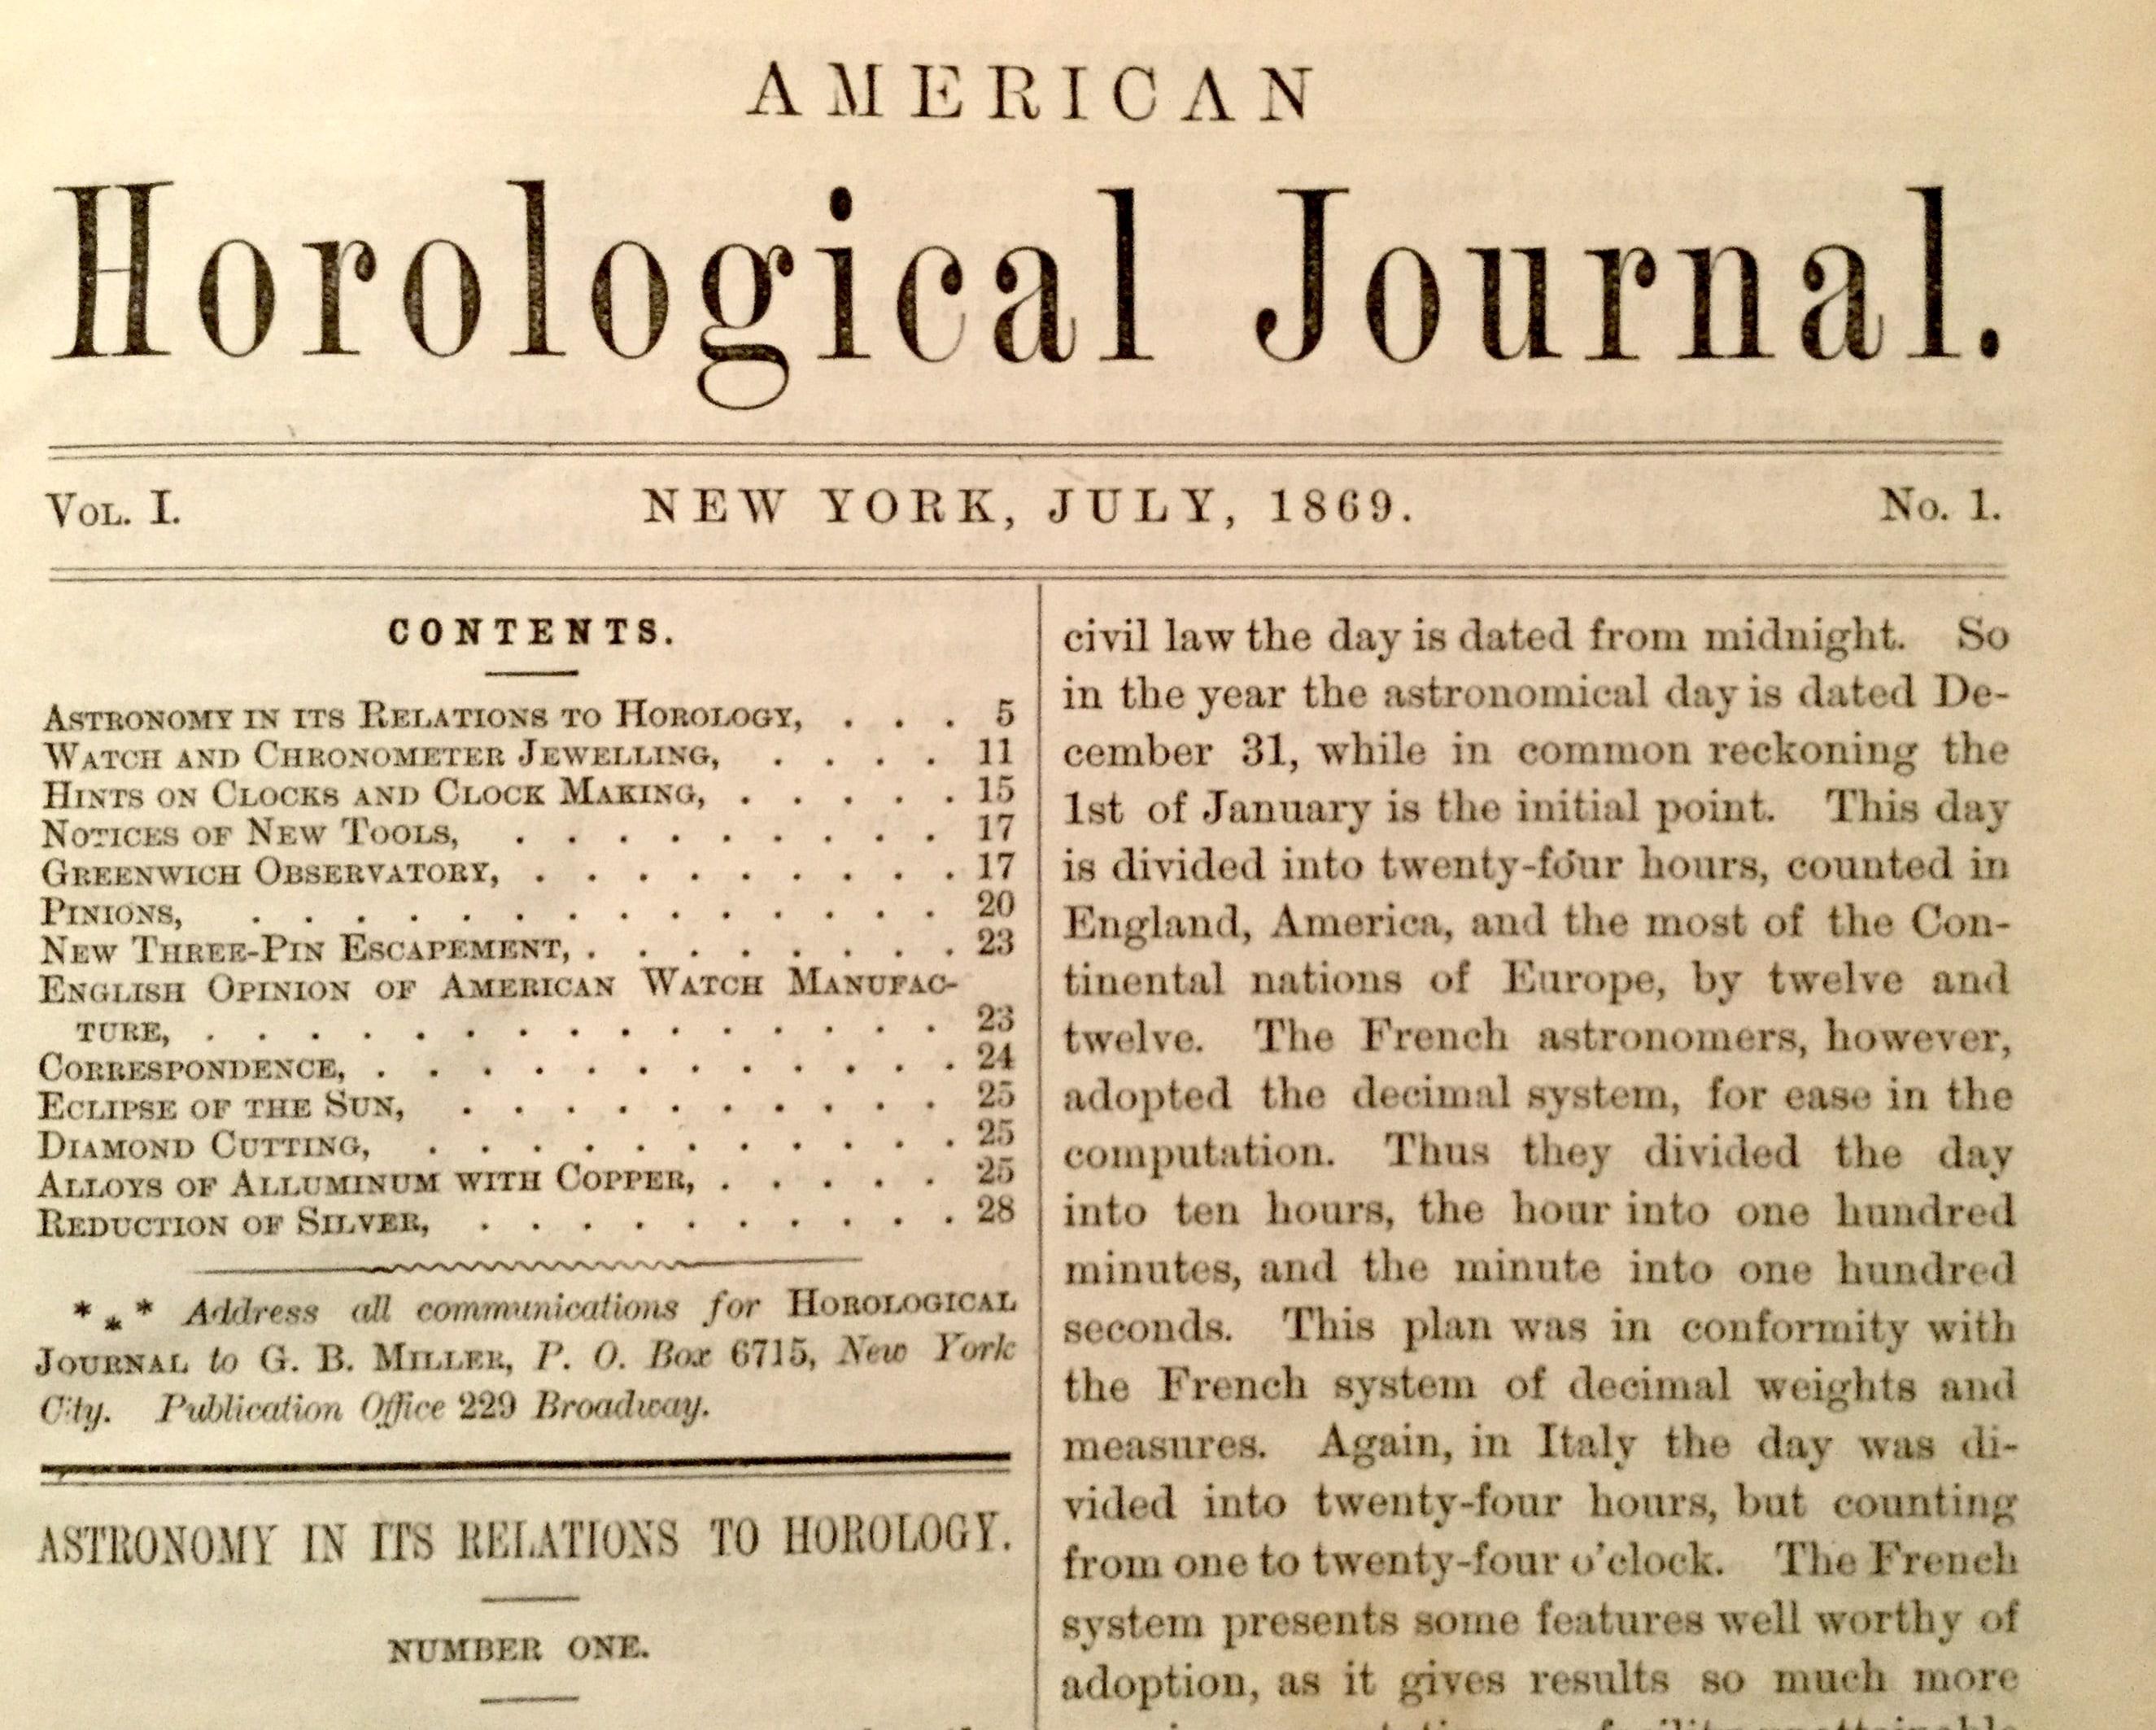 American Horological Journal